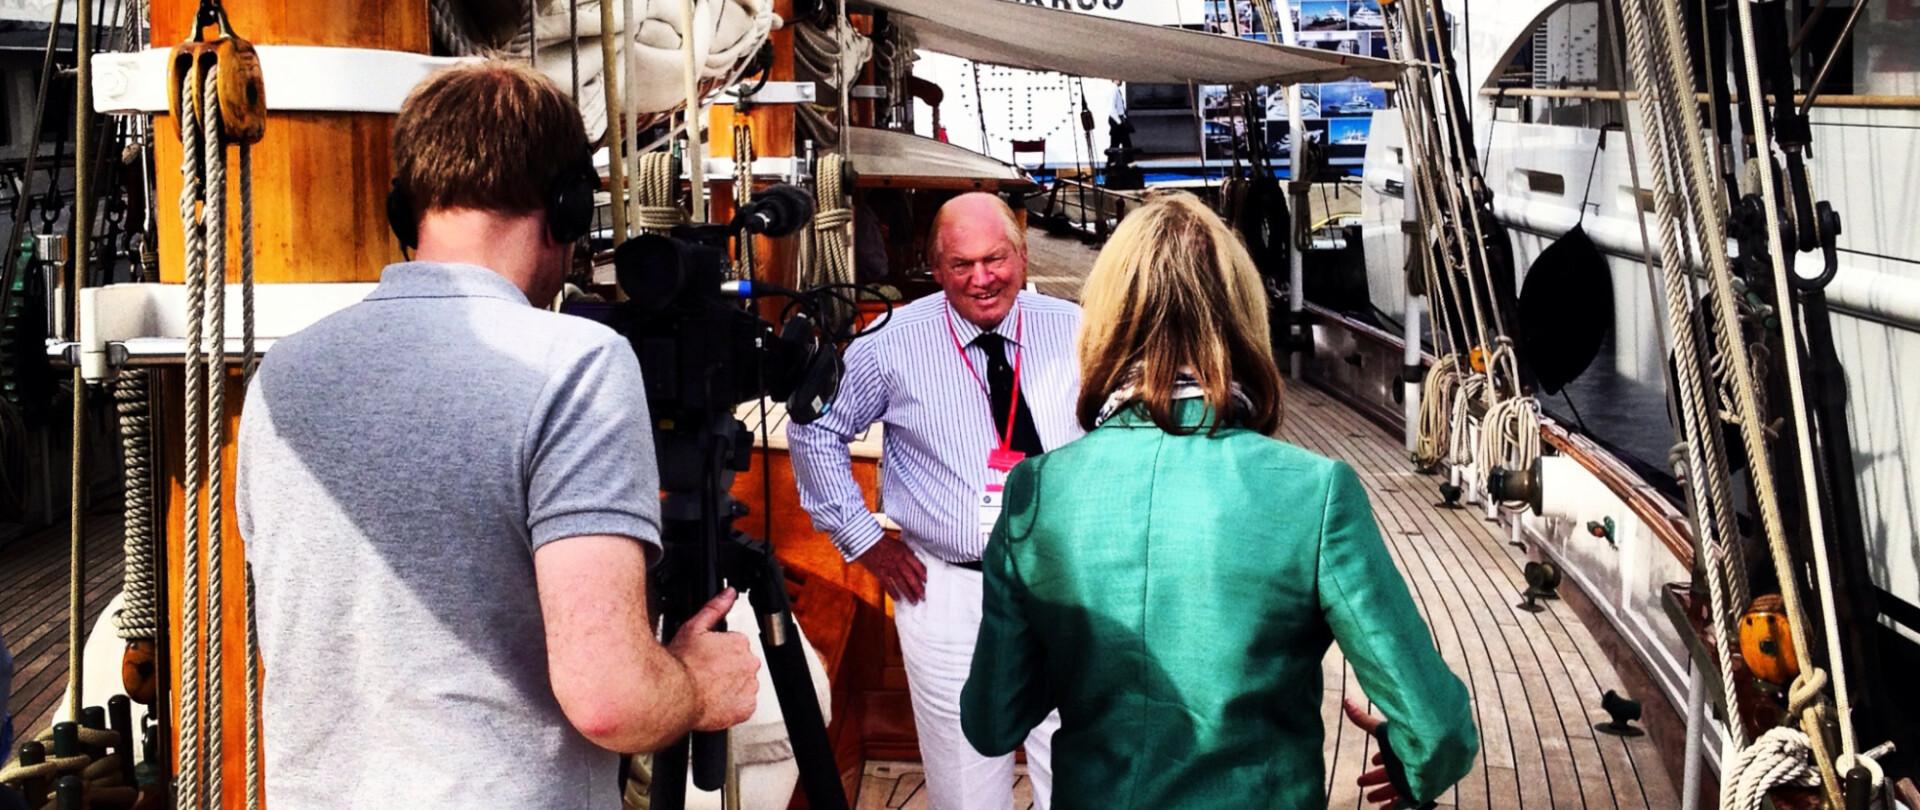 Edmiston Interview with BBC at the Monaco Yacht Show photo 2